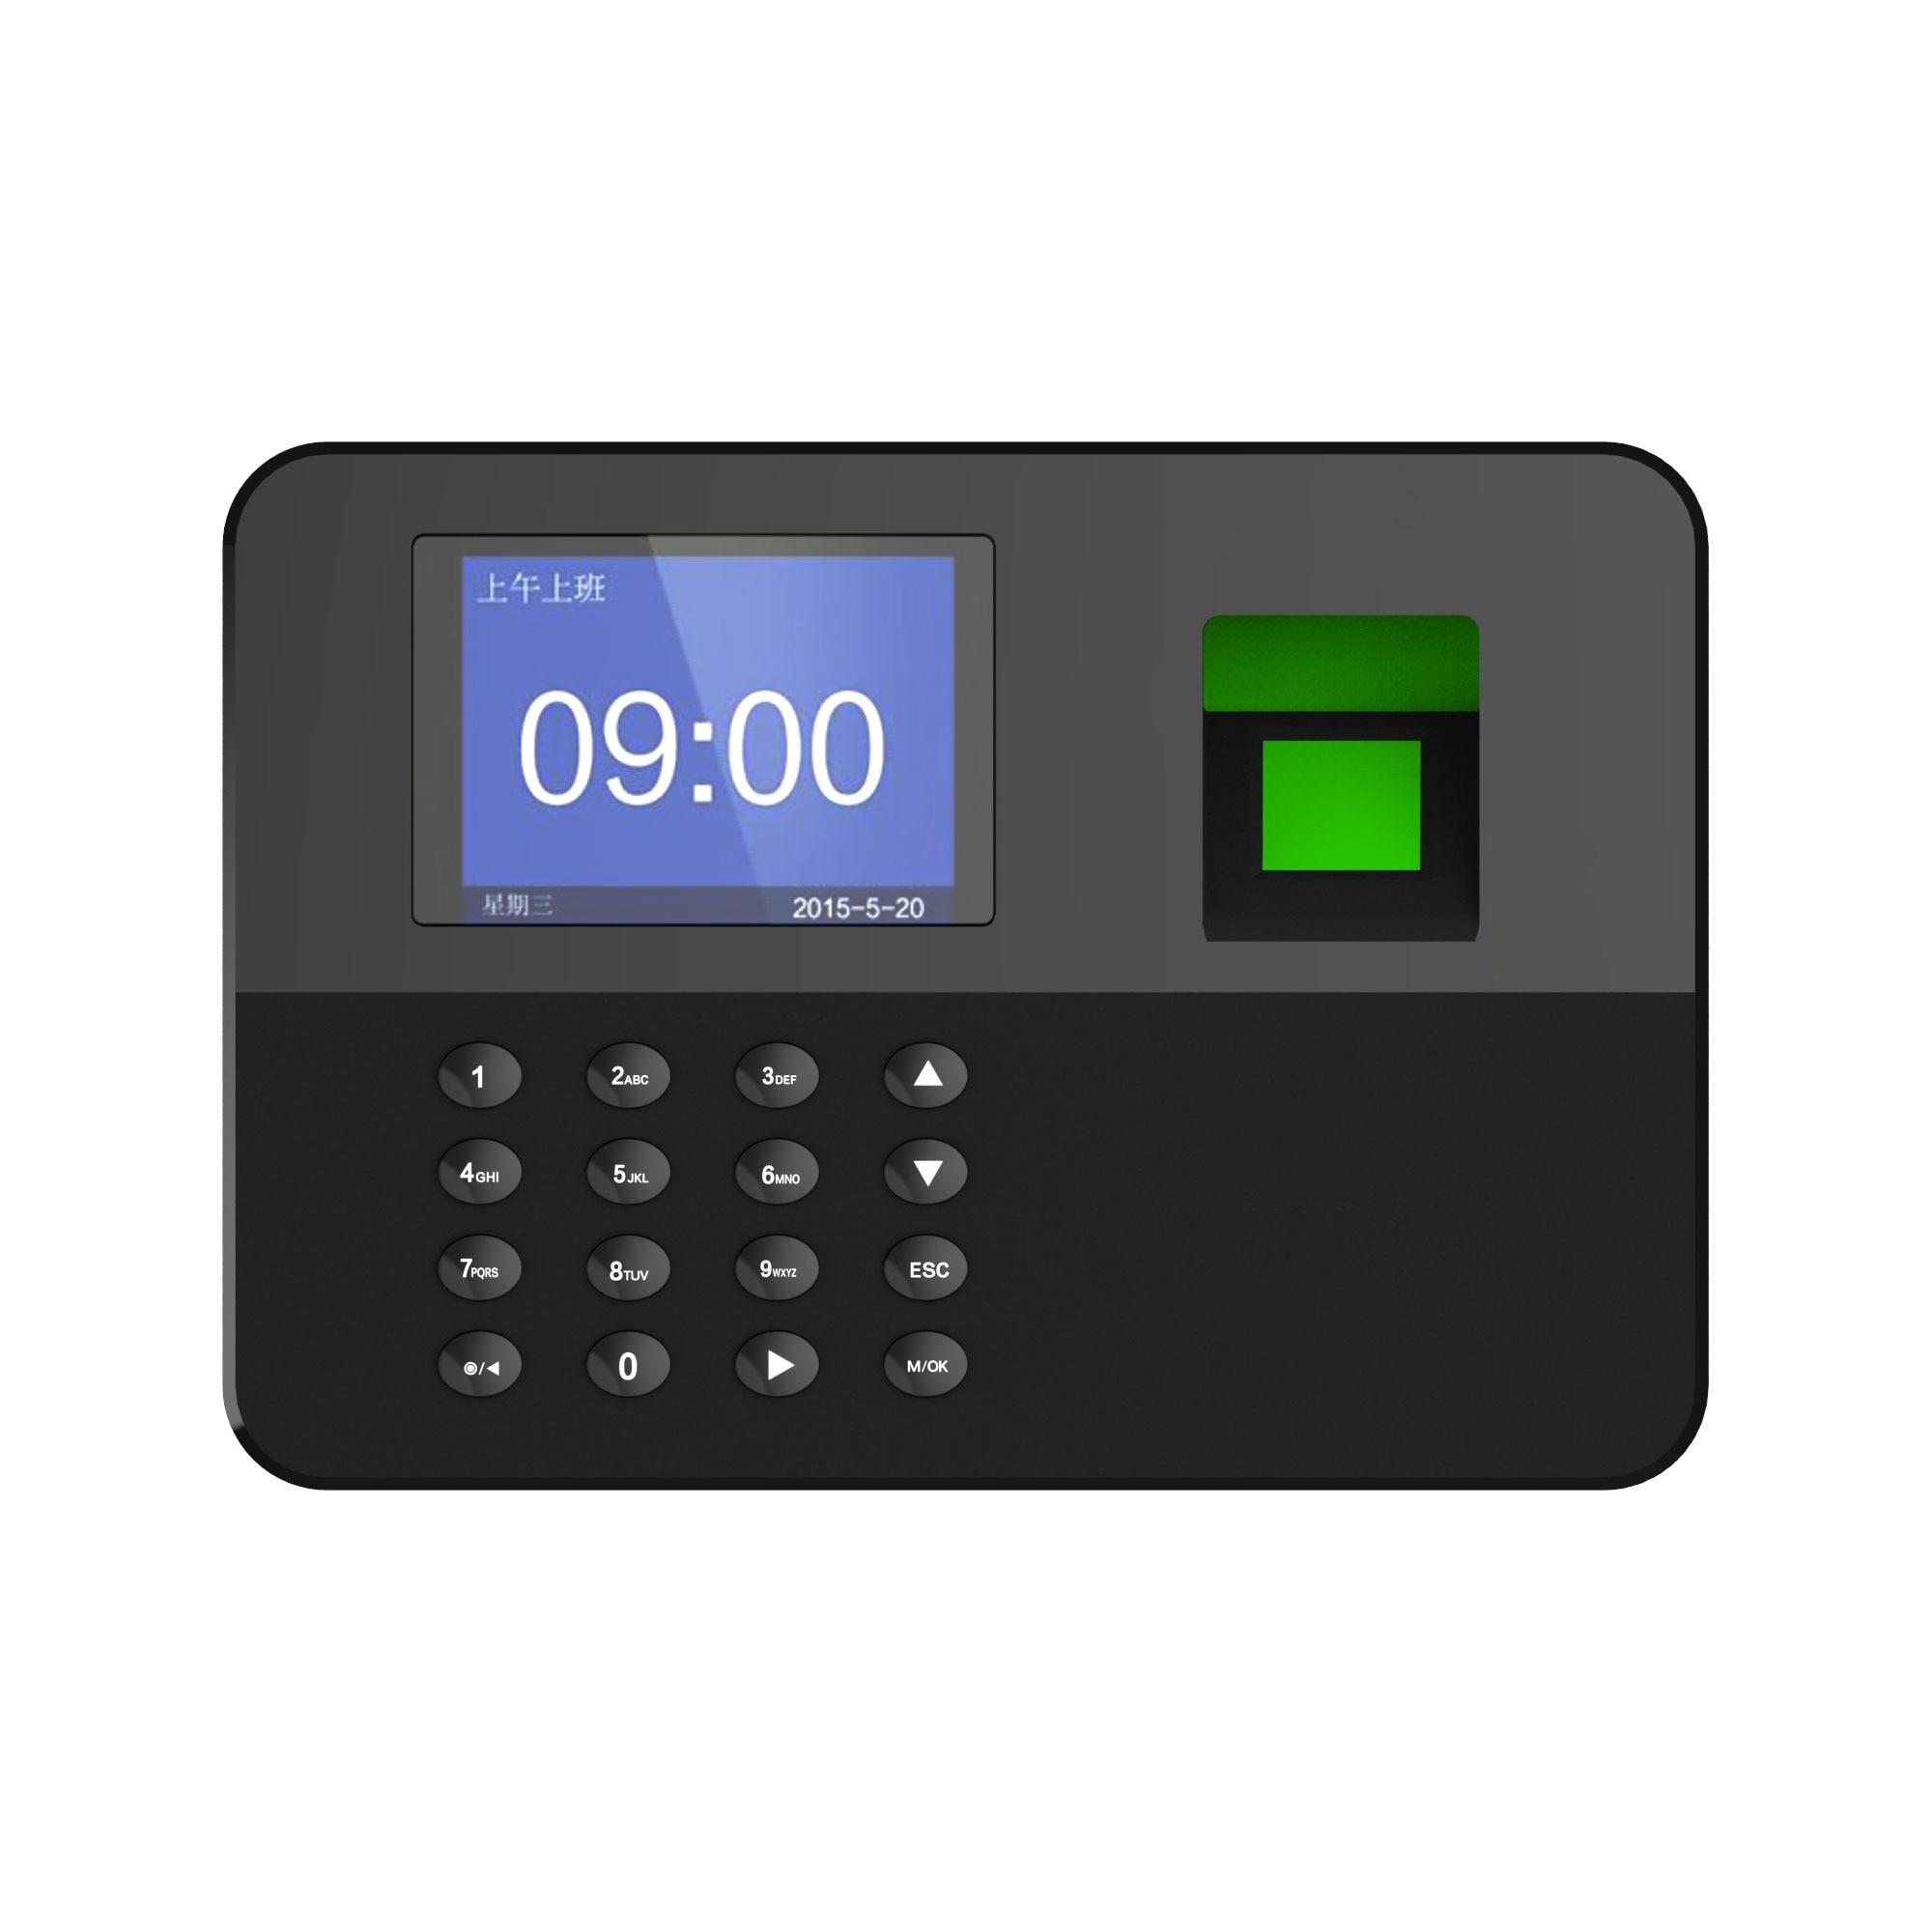 NETUM Biometric Fingerprint Password Attendance Machine with 2.4 inch LCD Screen Employee Management Time Clock Multi-language